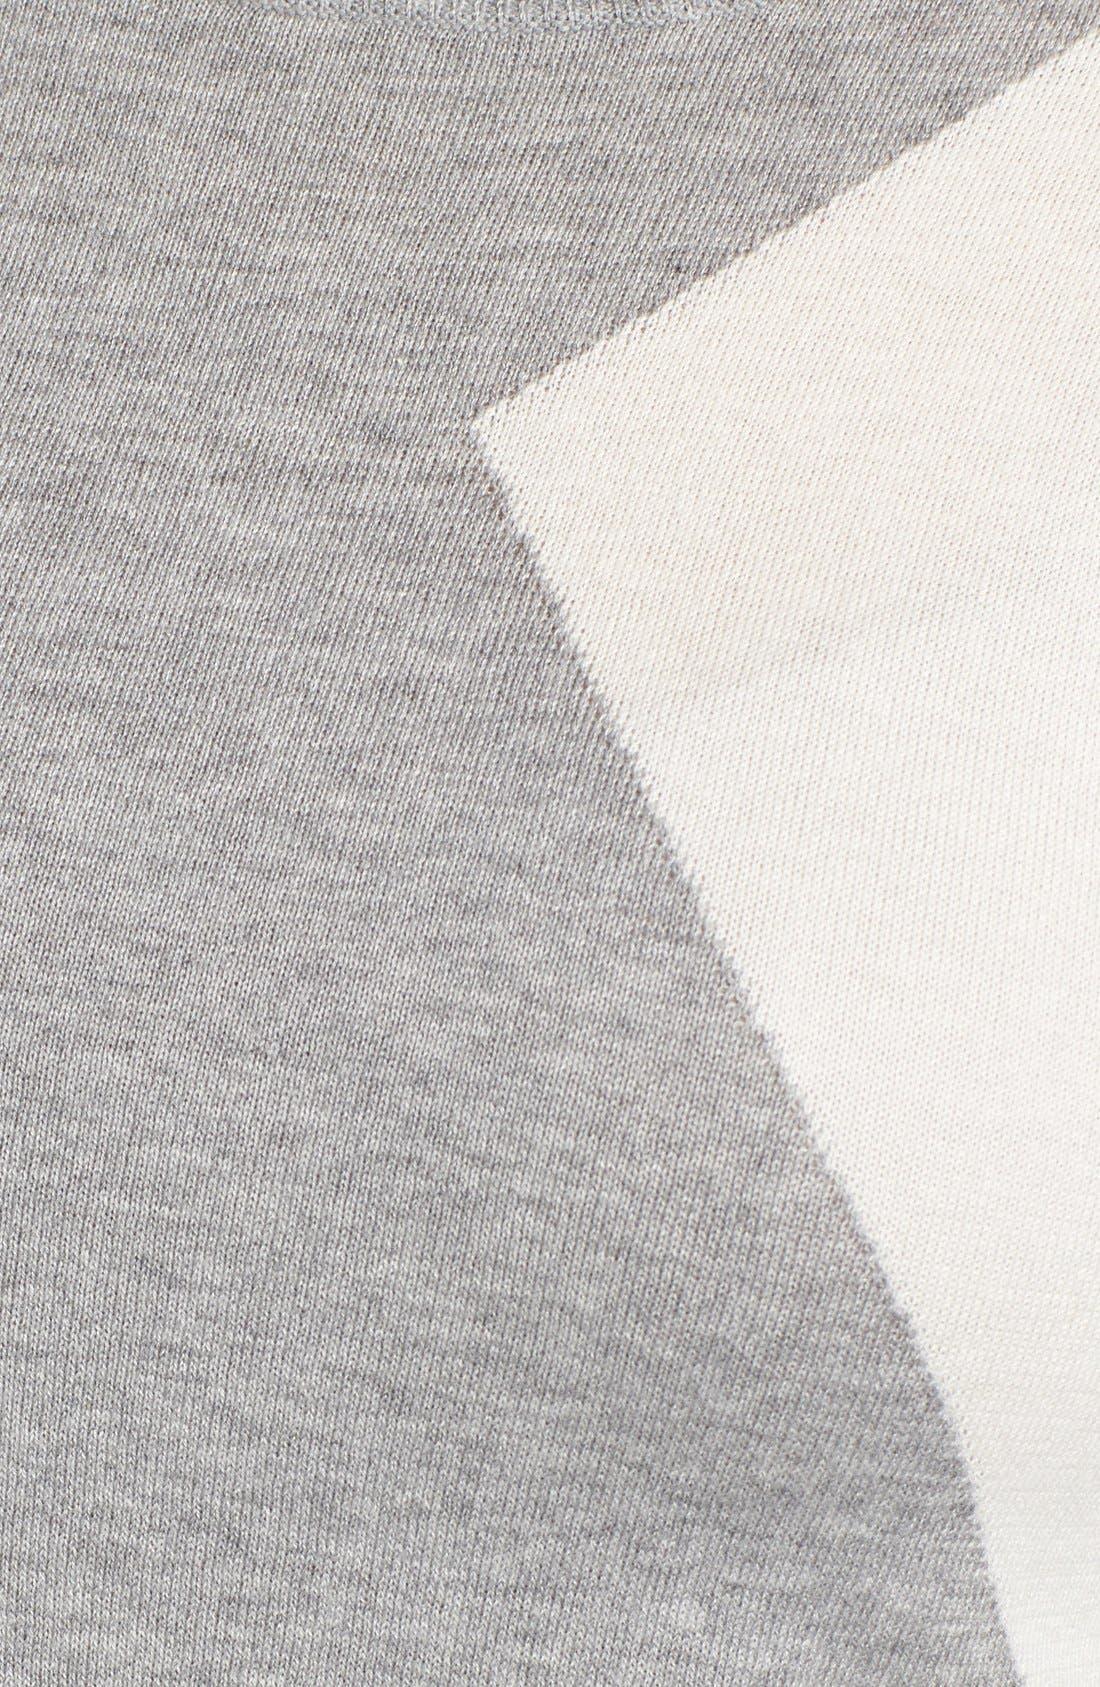 Cotton Blend Pullover,                             Alternate thumbnail 134, color,